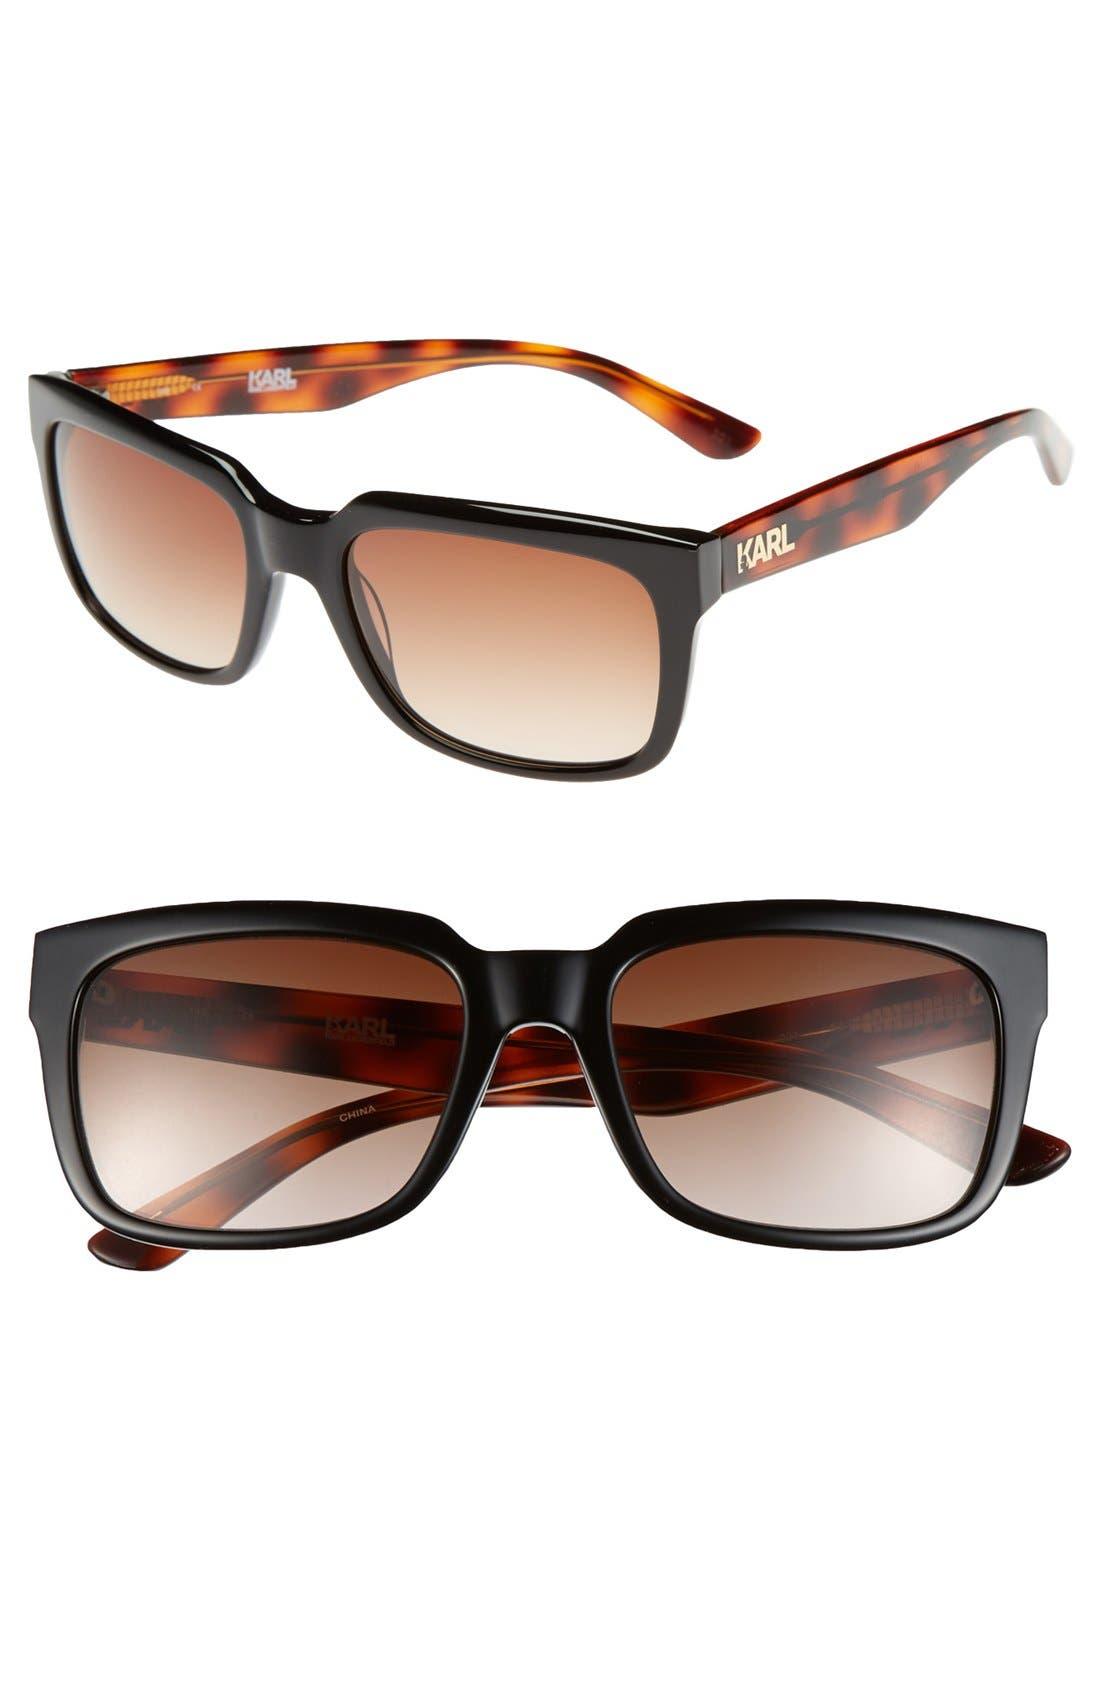 Main Image - Karl Lagerfeld 54mm Sunglasses